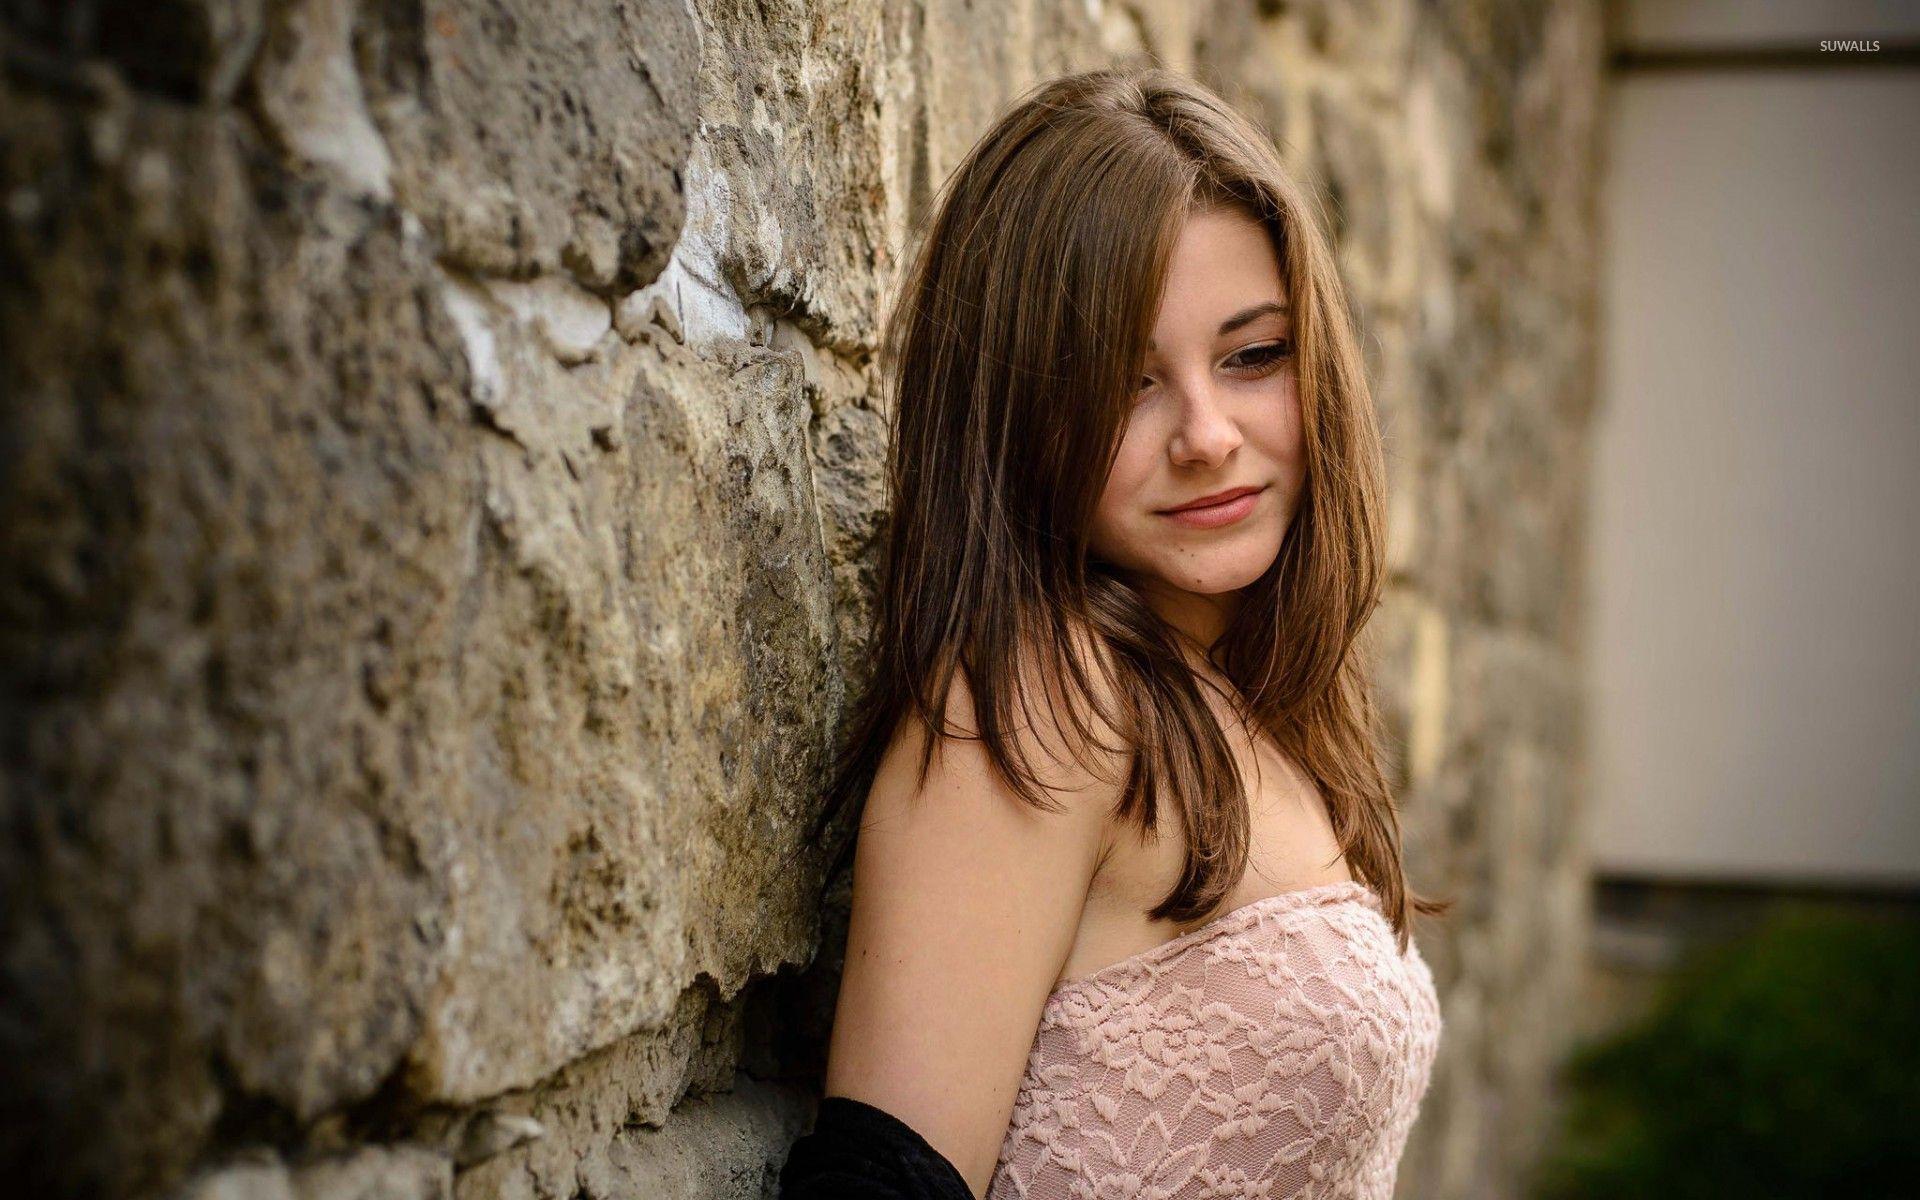 cute girl [2] wallpaper - girl wallpapers - #46386